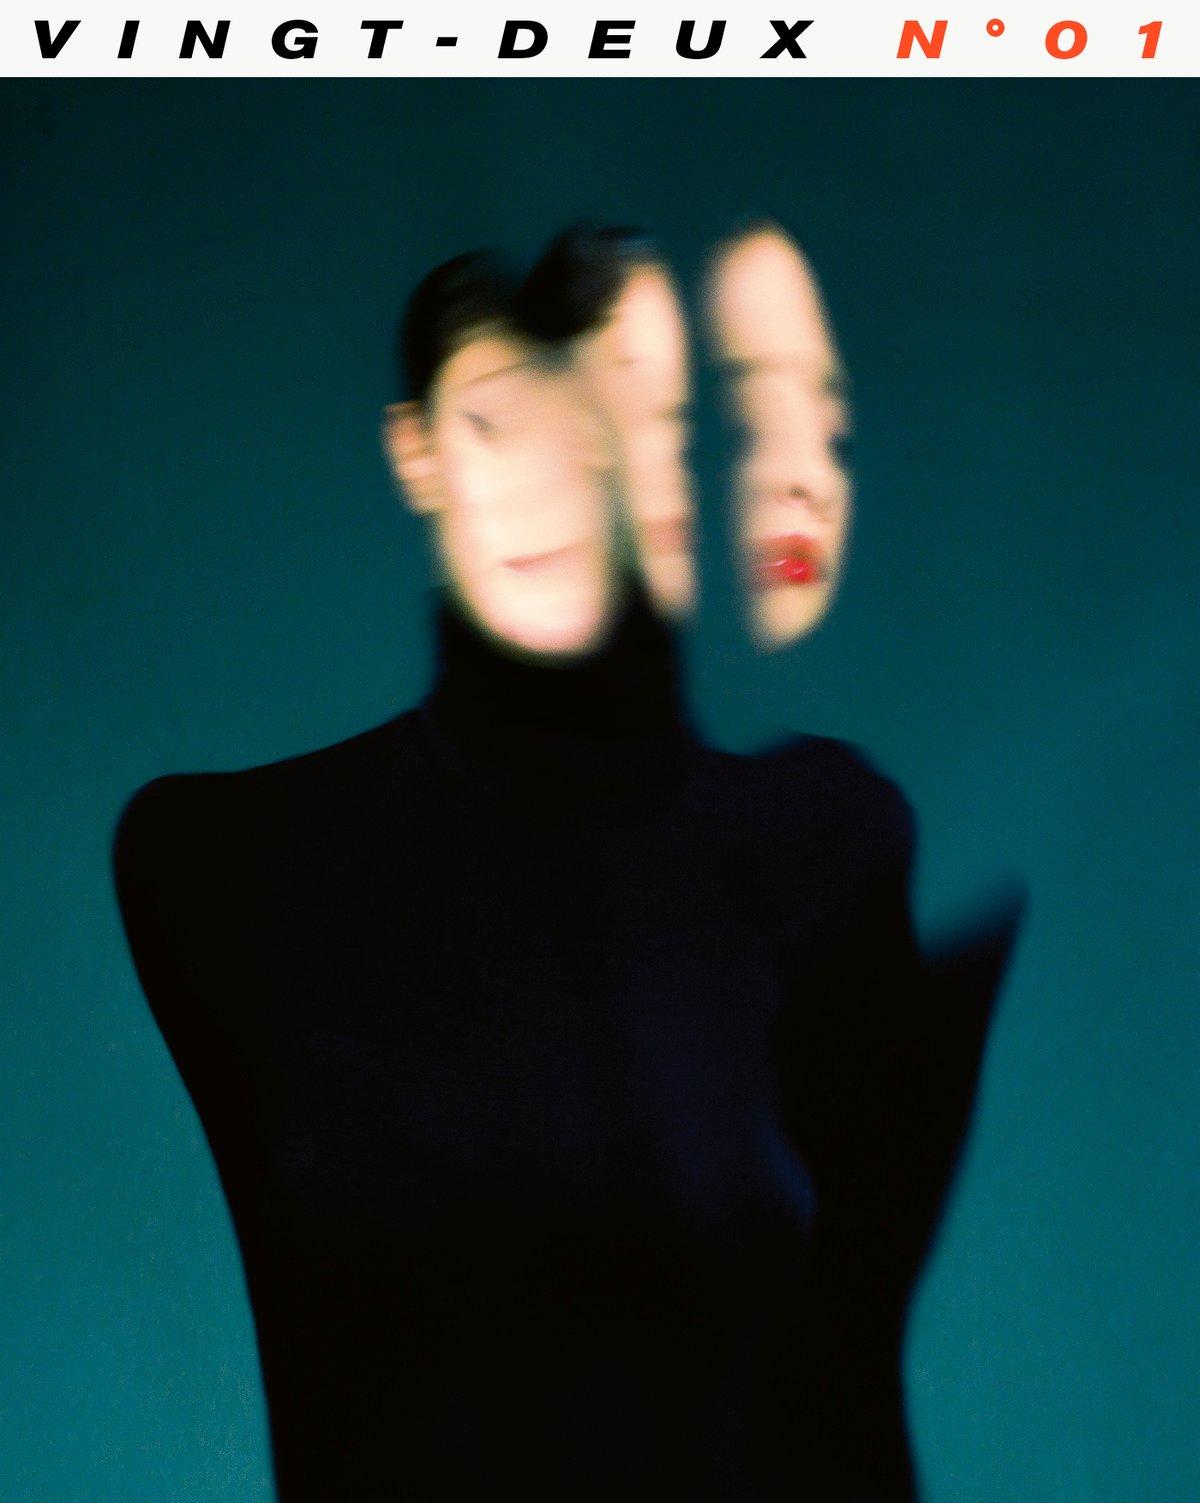 Image of VINGT-DEUX N°01 - cover 1